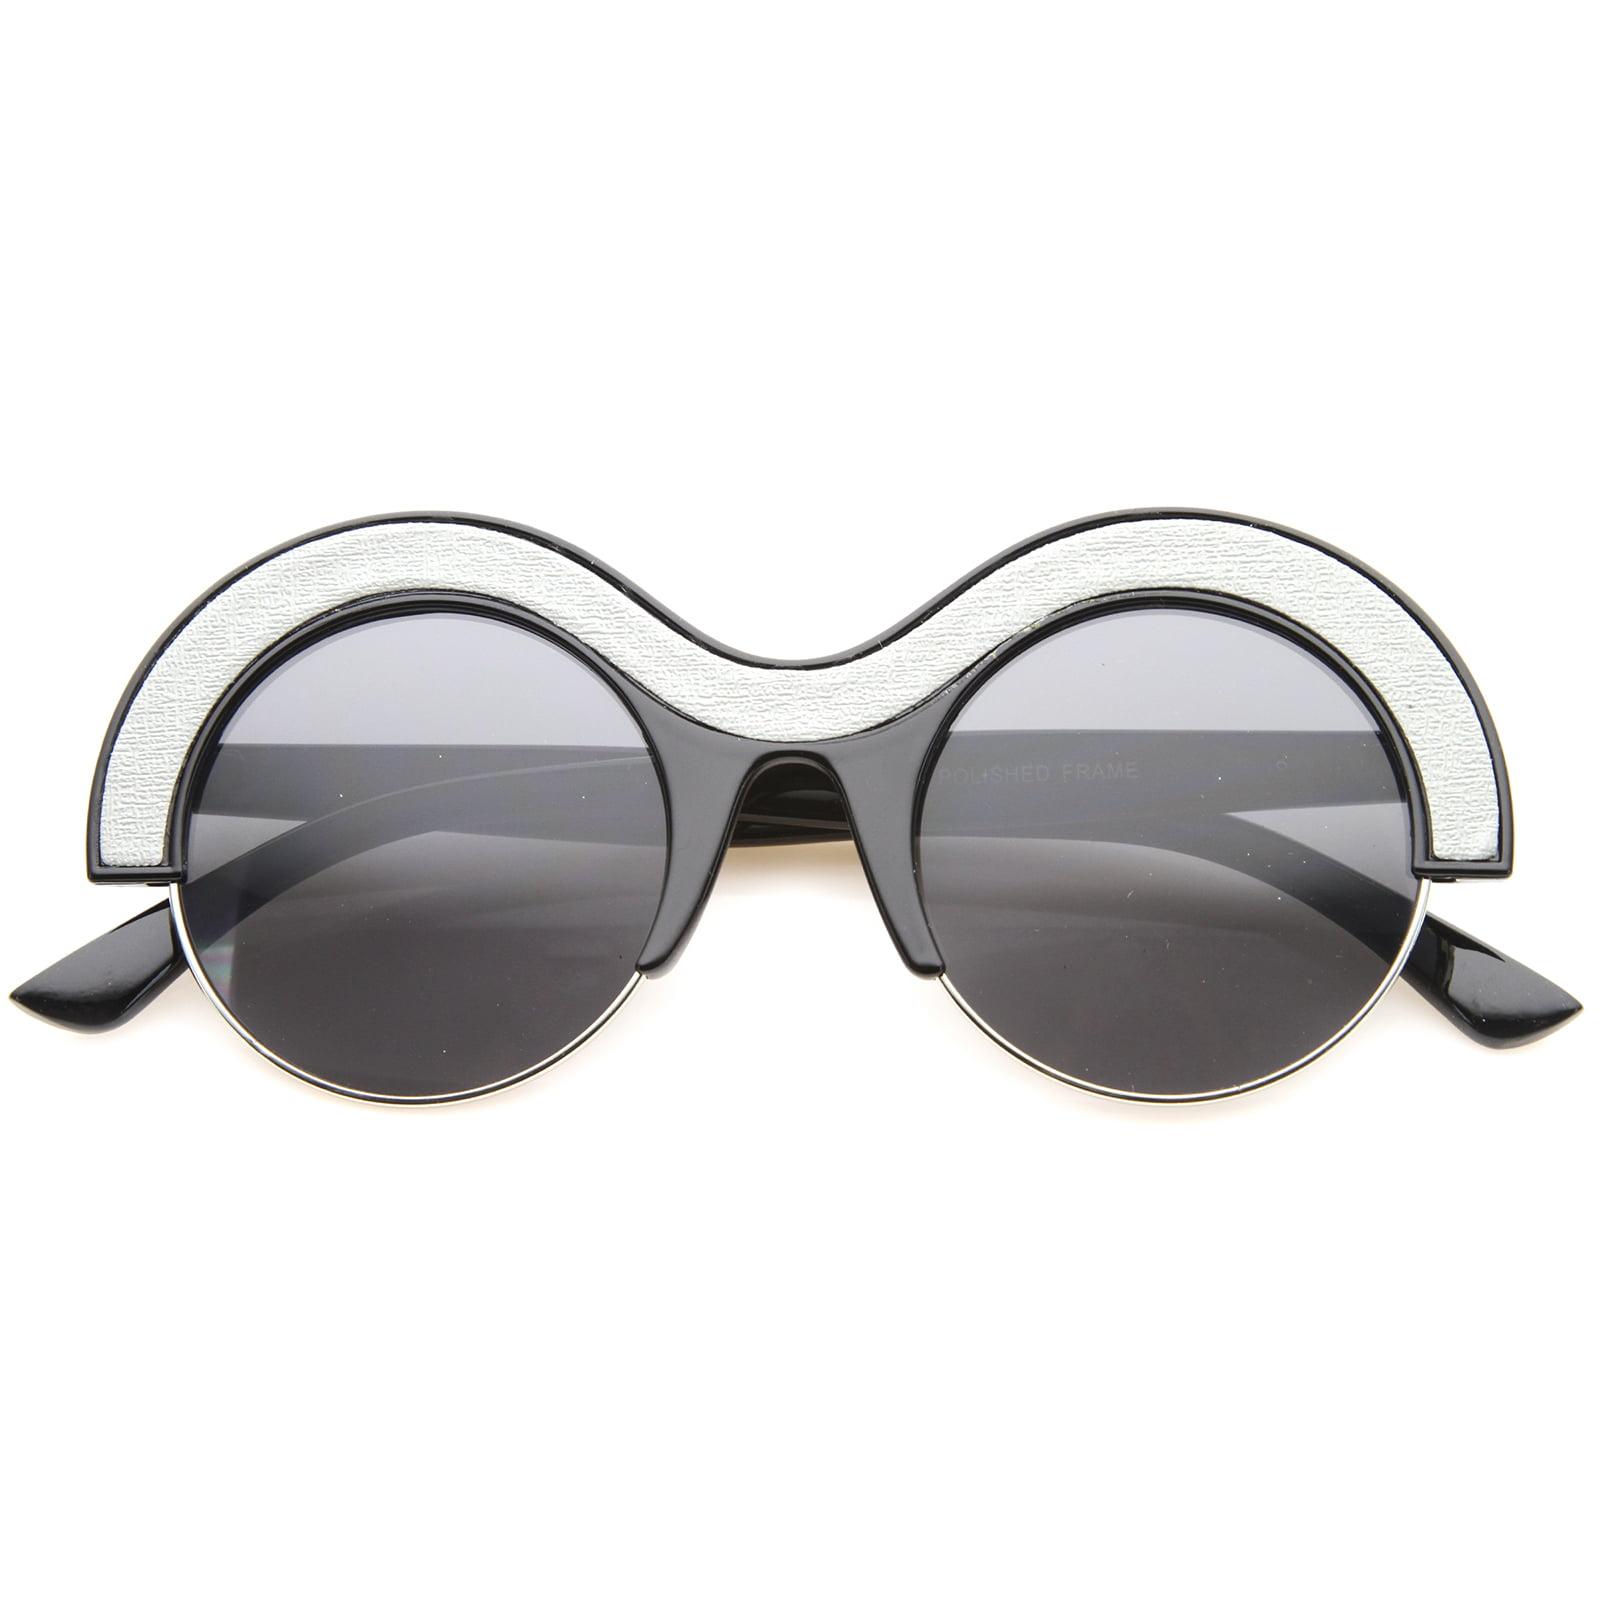 clear sunglassla men s sunglasses walmart Men's Eyeglasses 2018 sunglassla womens round sunglasses with uv400 protected mirrored lens 49mm